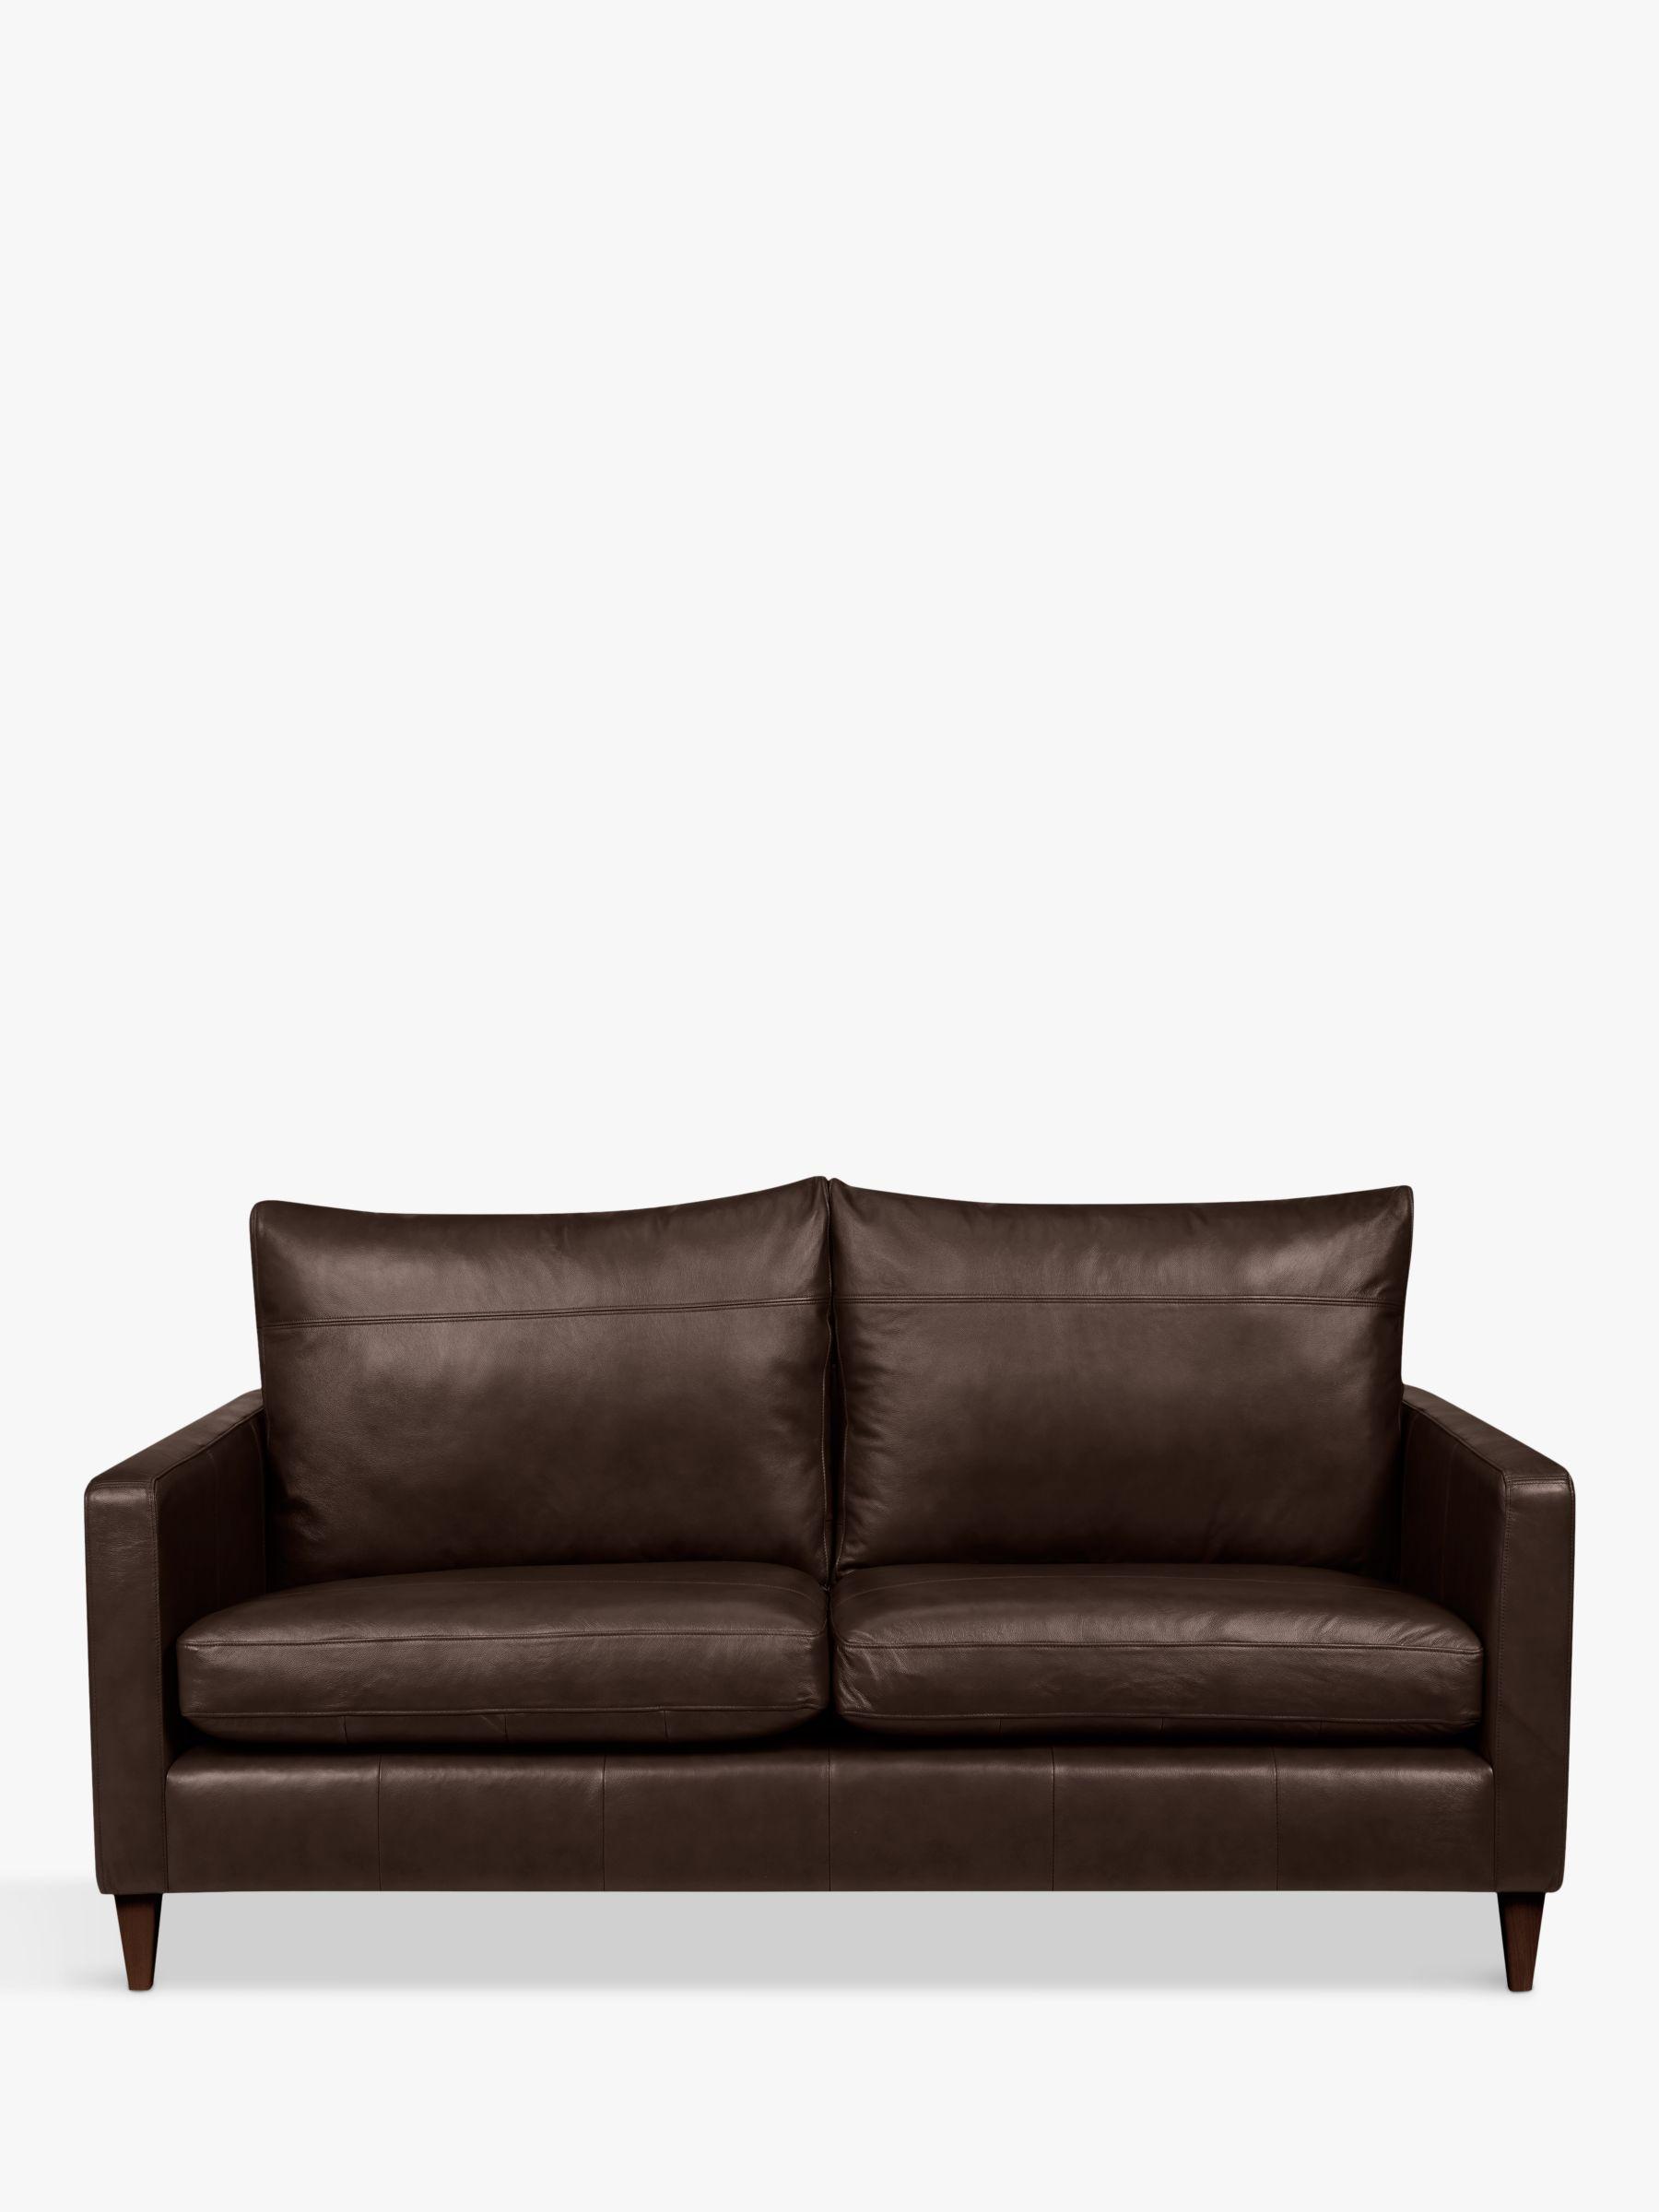 Bailey Medium 2 Seater Leather Sofa